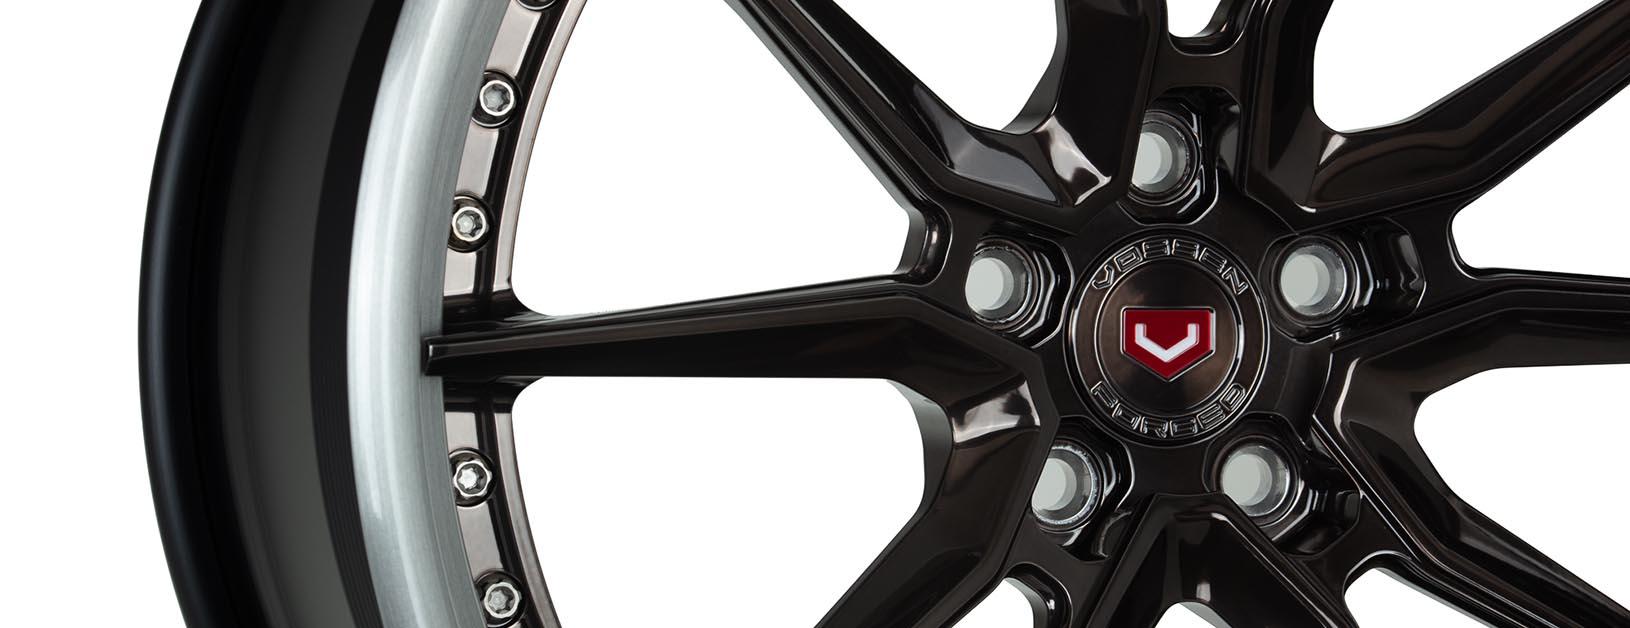 Vossen-EVO-2-3P-Venetian-Bronze-C03-EVO-Series-©-Vossen-Wheels-2019-0711-Edit